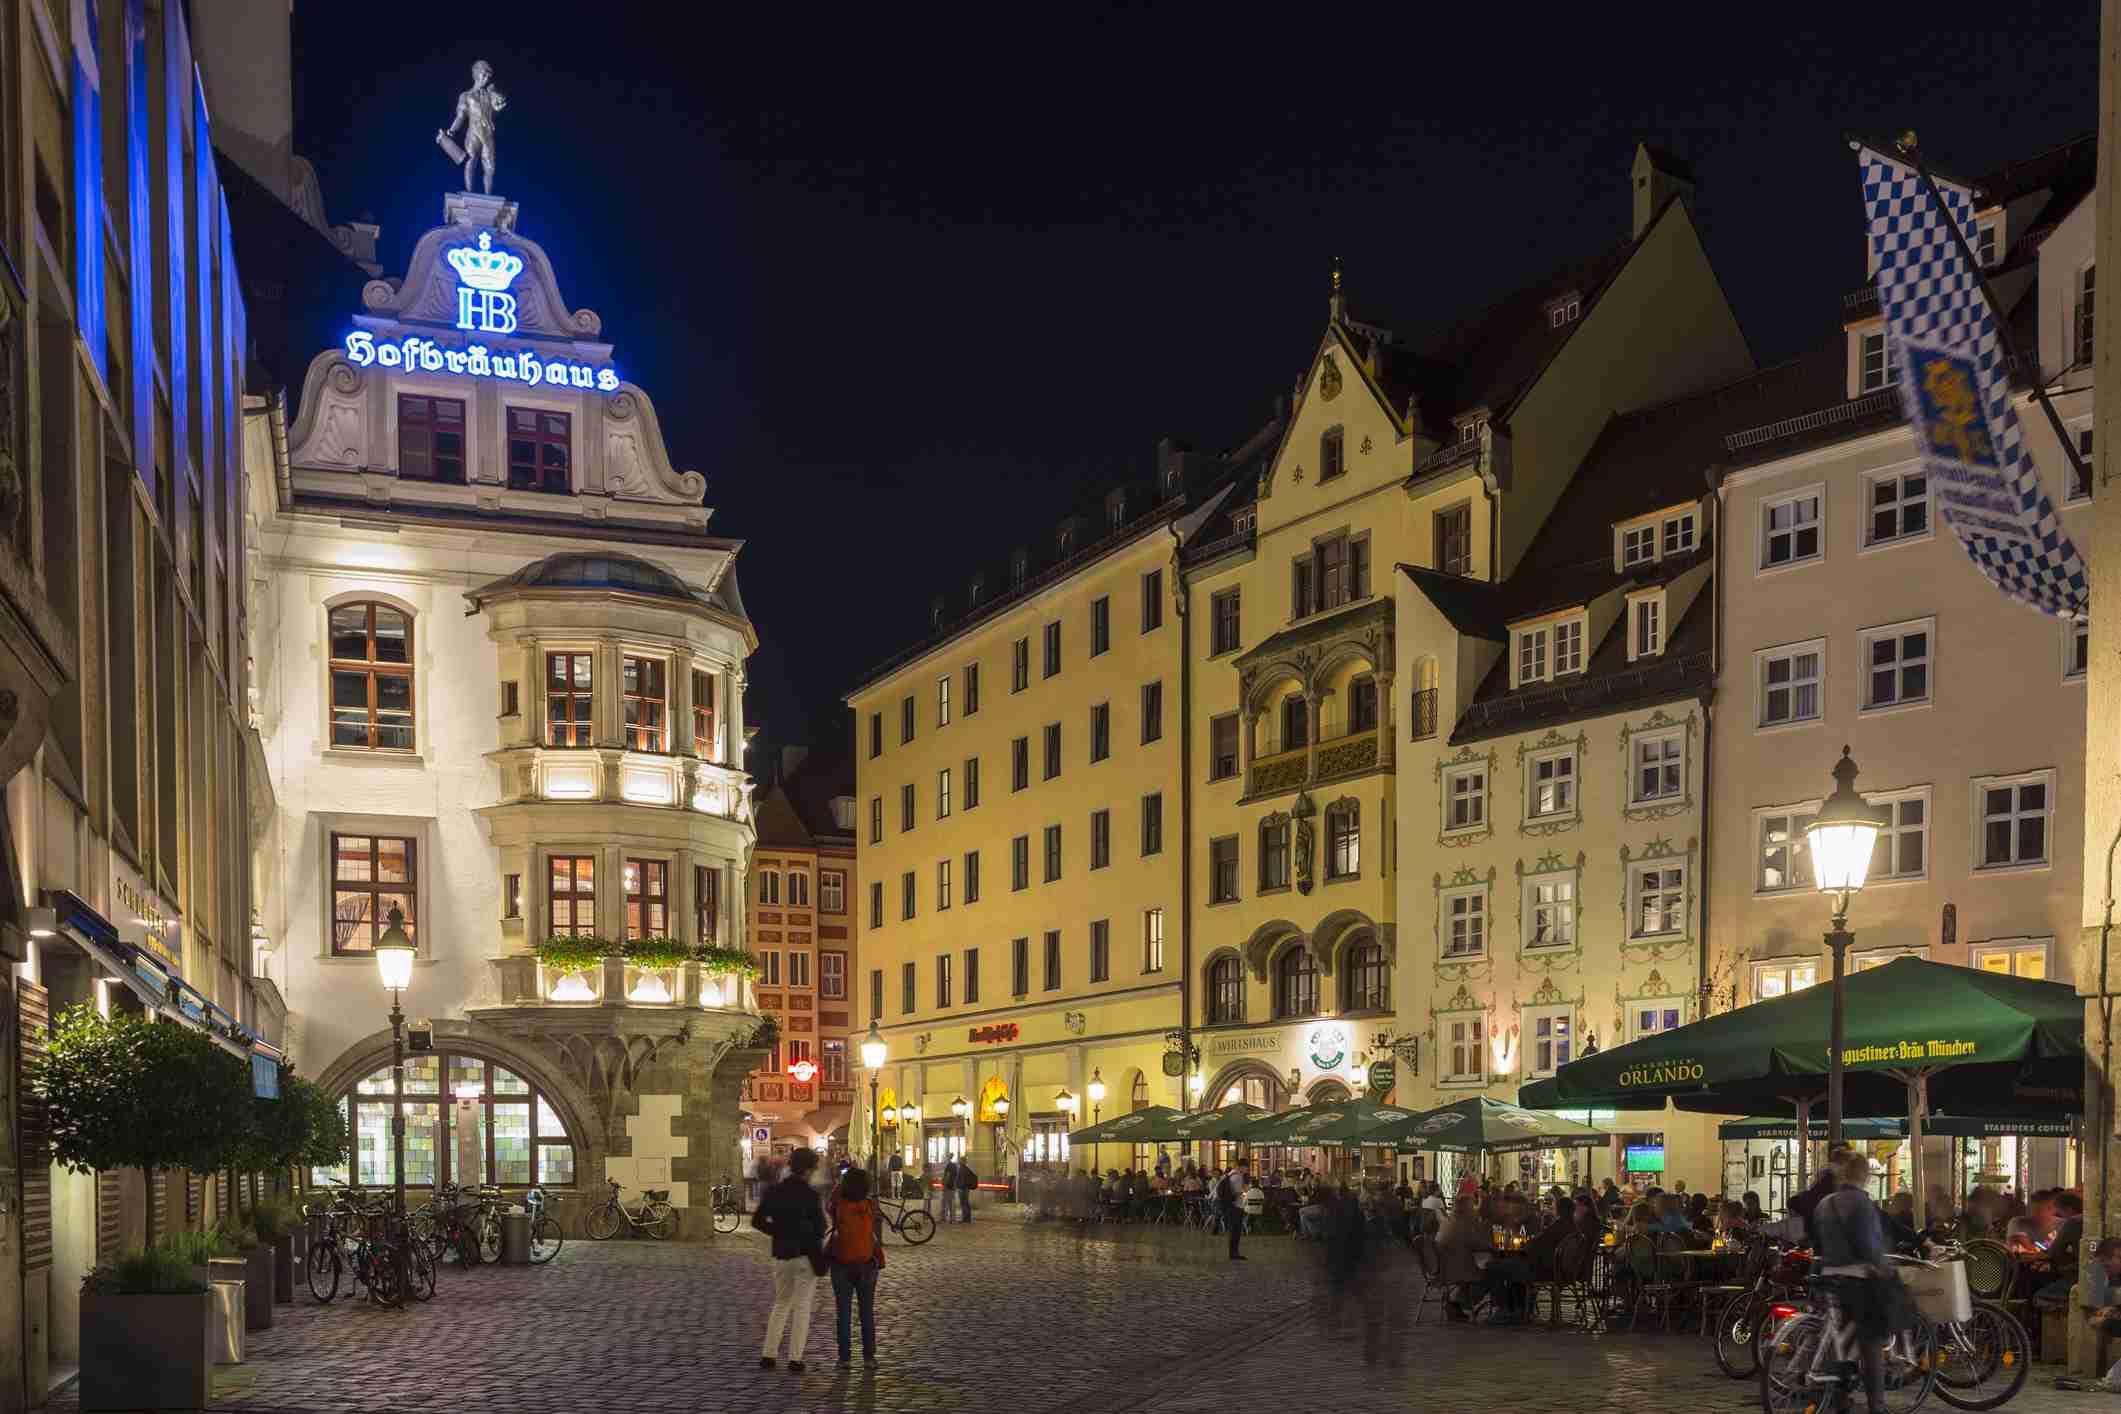 La Hofbrauhaus en la noche en Munich, Alemania